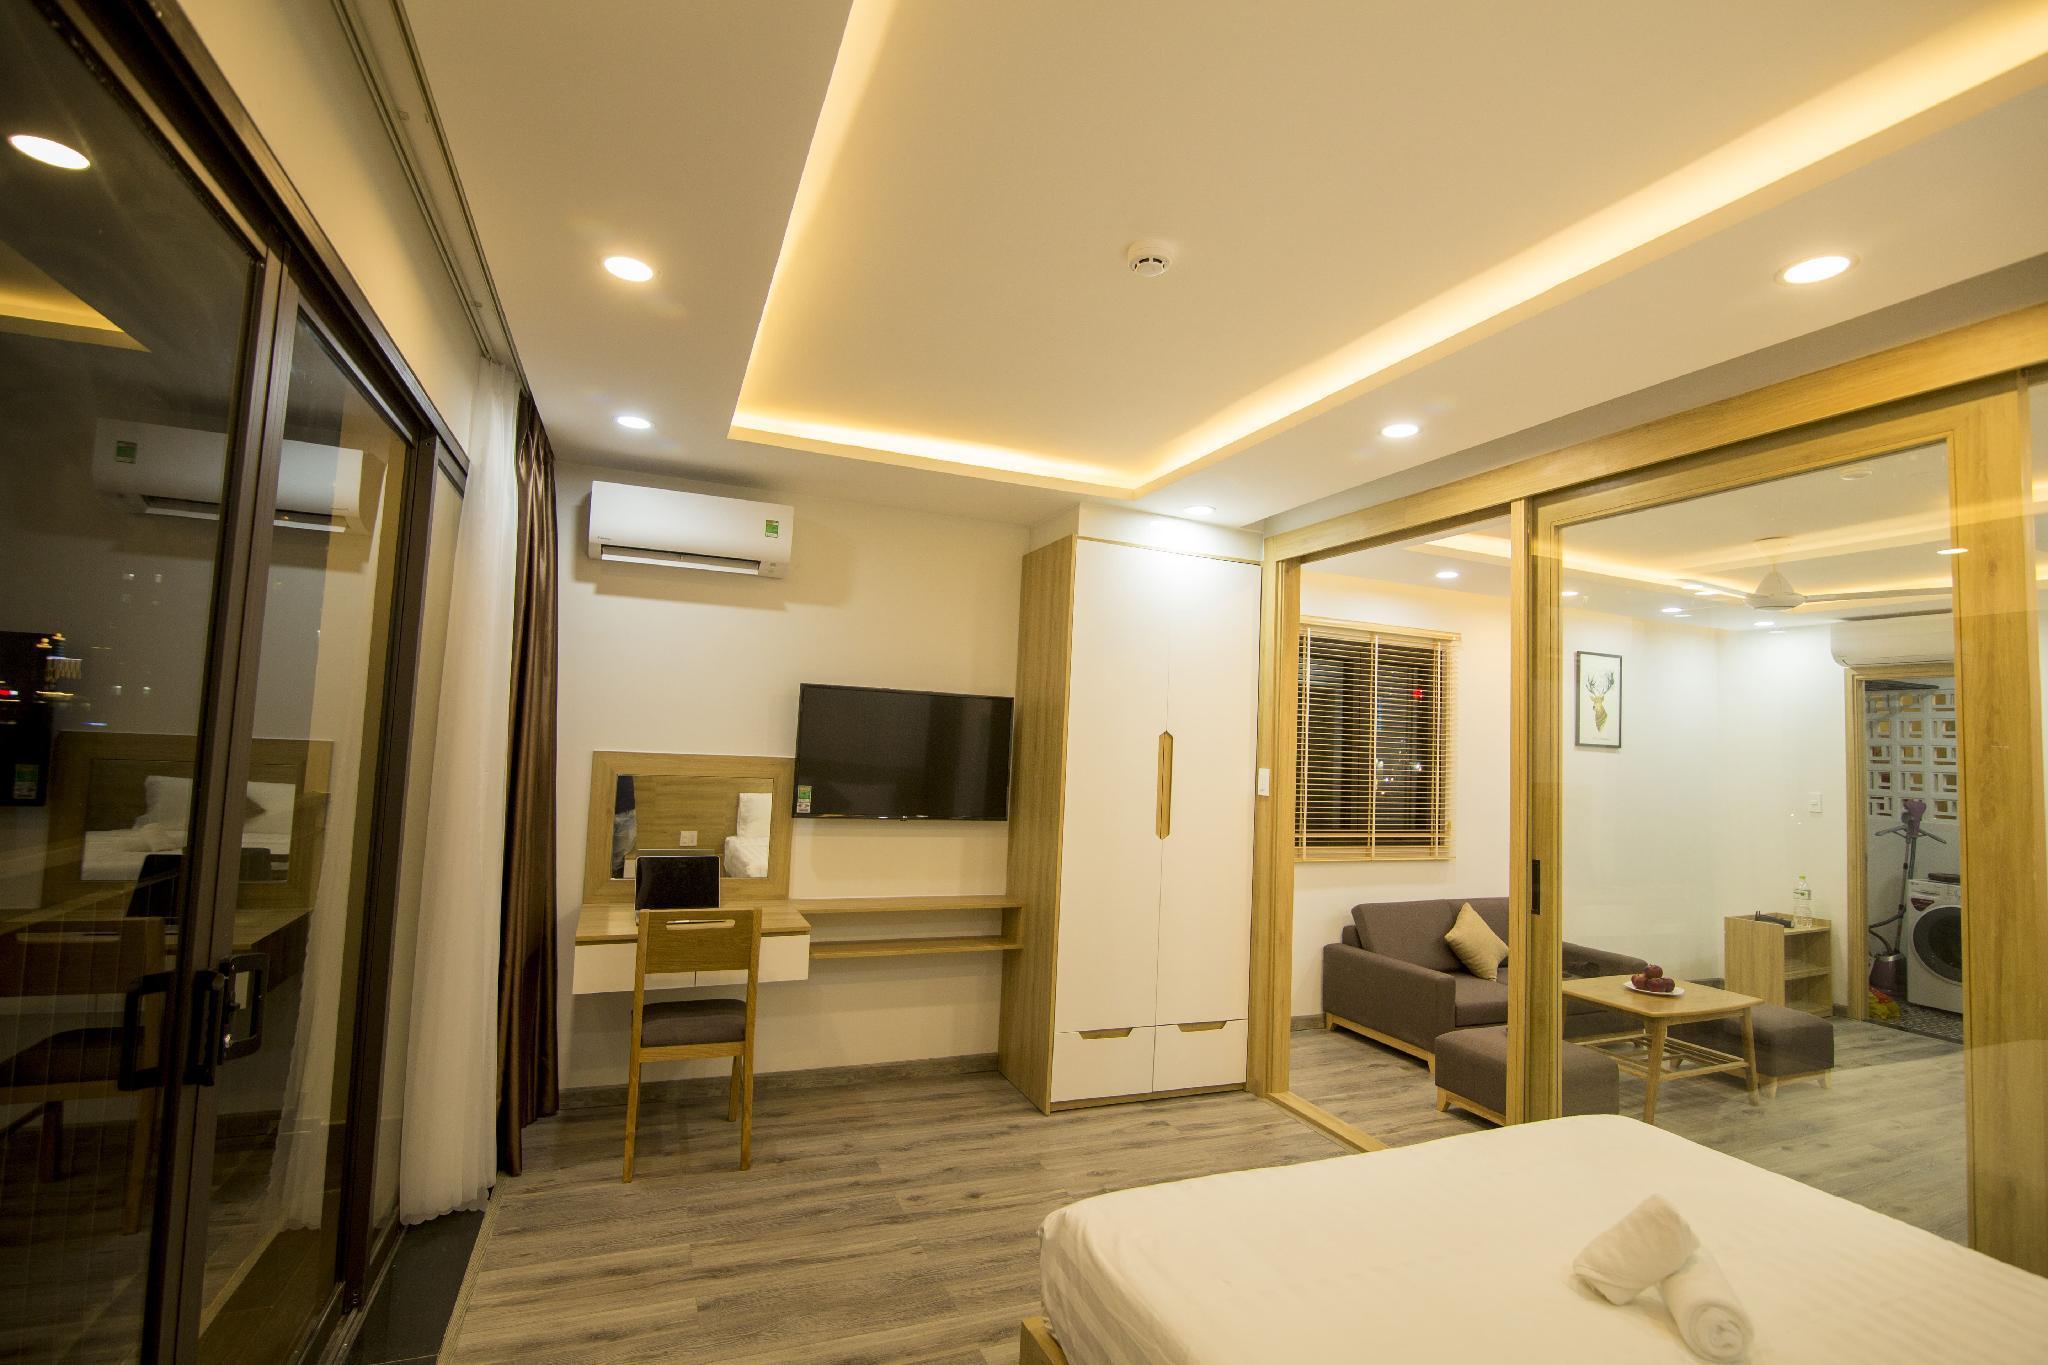 TONY APARTMENT*65m2*1BR*Luxury*Balcony*Beach*D